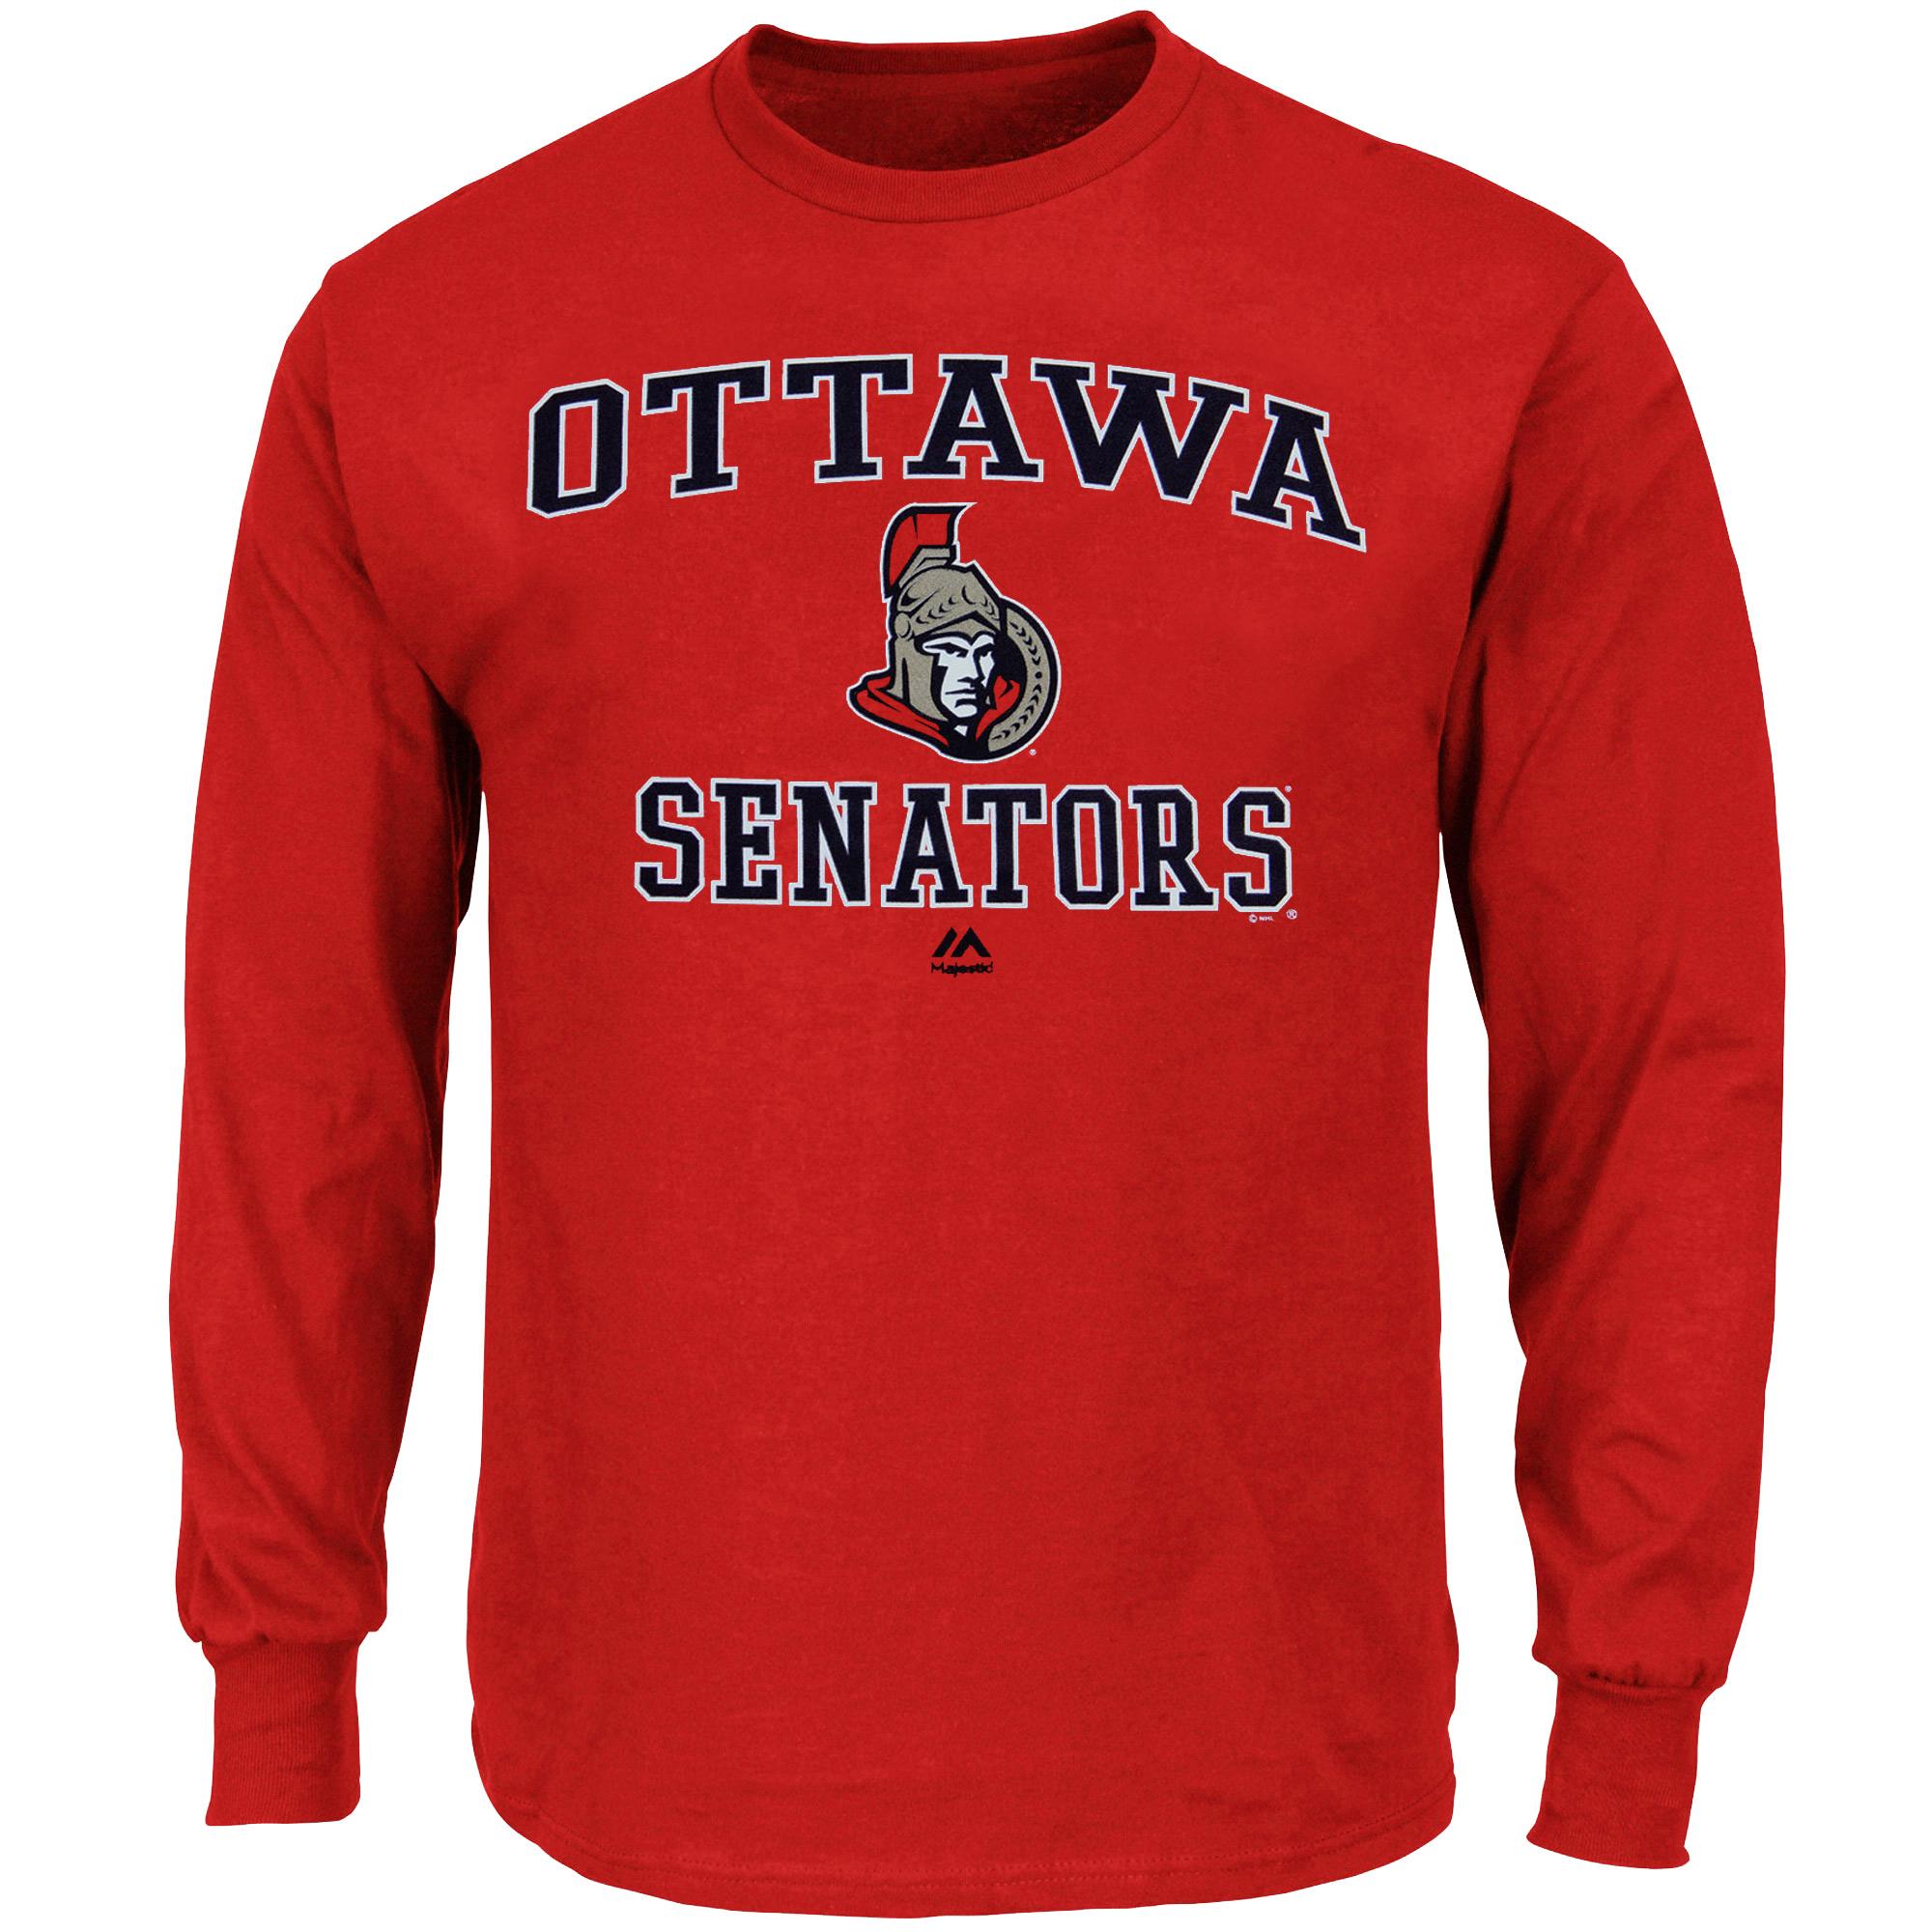 Ottawa Senators Majestic Heart and Soul Long Sleeve T-Shirt - Red